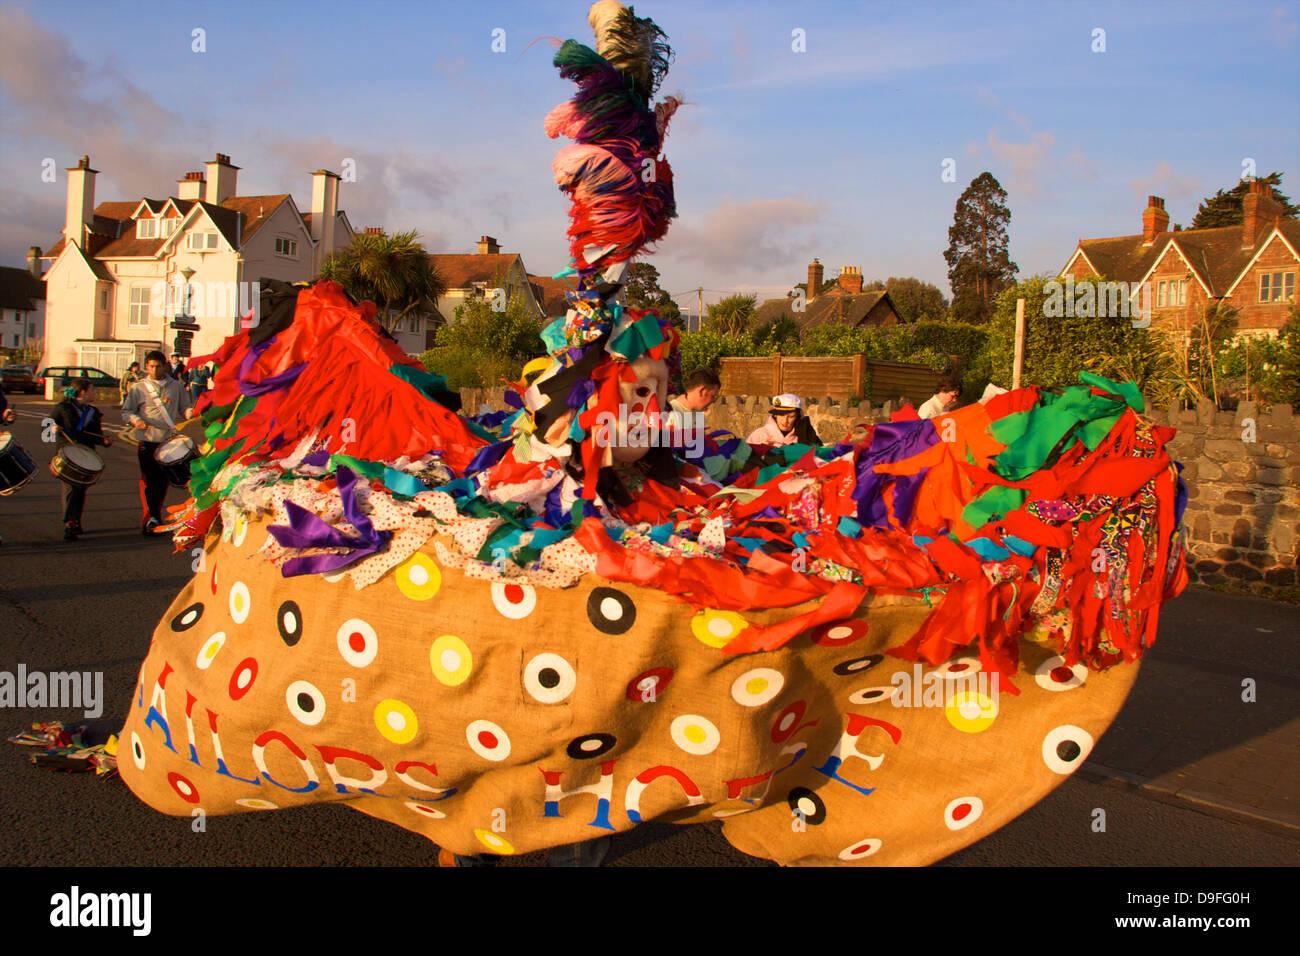 Maifeiertag Hobby Horse, Minehead, Somerset, England, Vereinigtes Königreich Stockbild